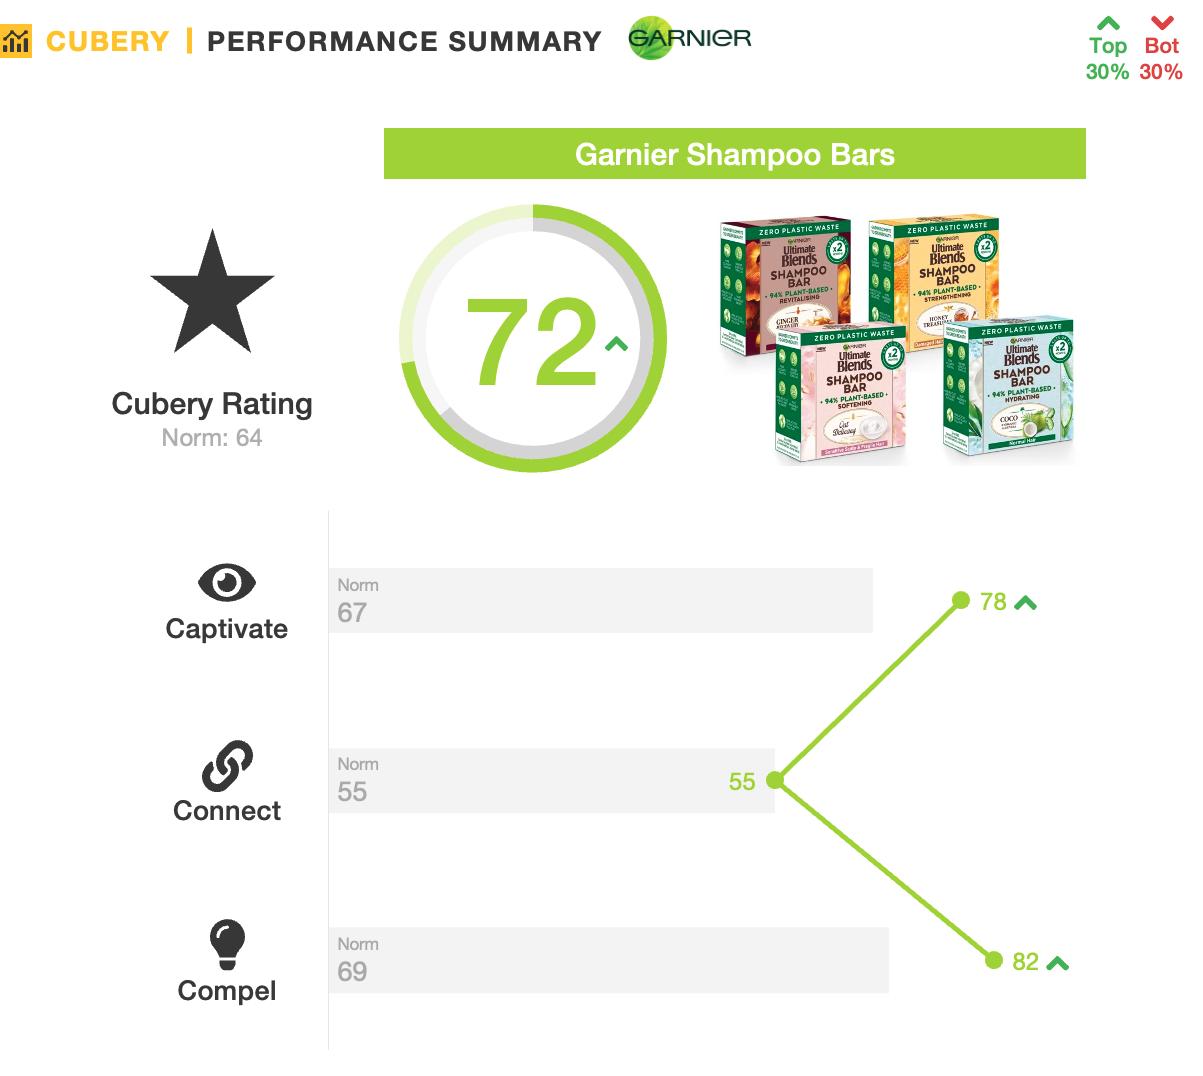 Garnier Ultimate Blends Shampoo Bar - New Product Testing - Performance Summary